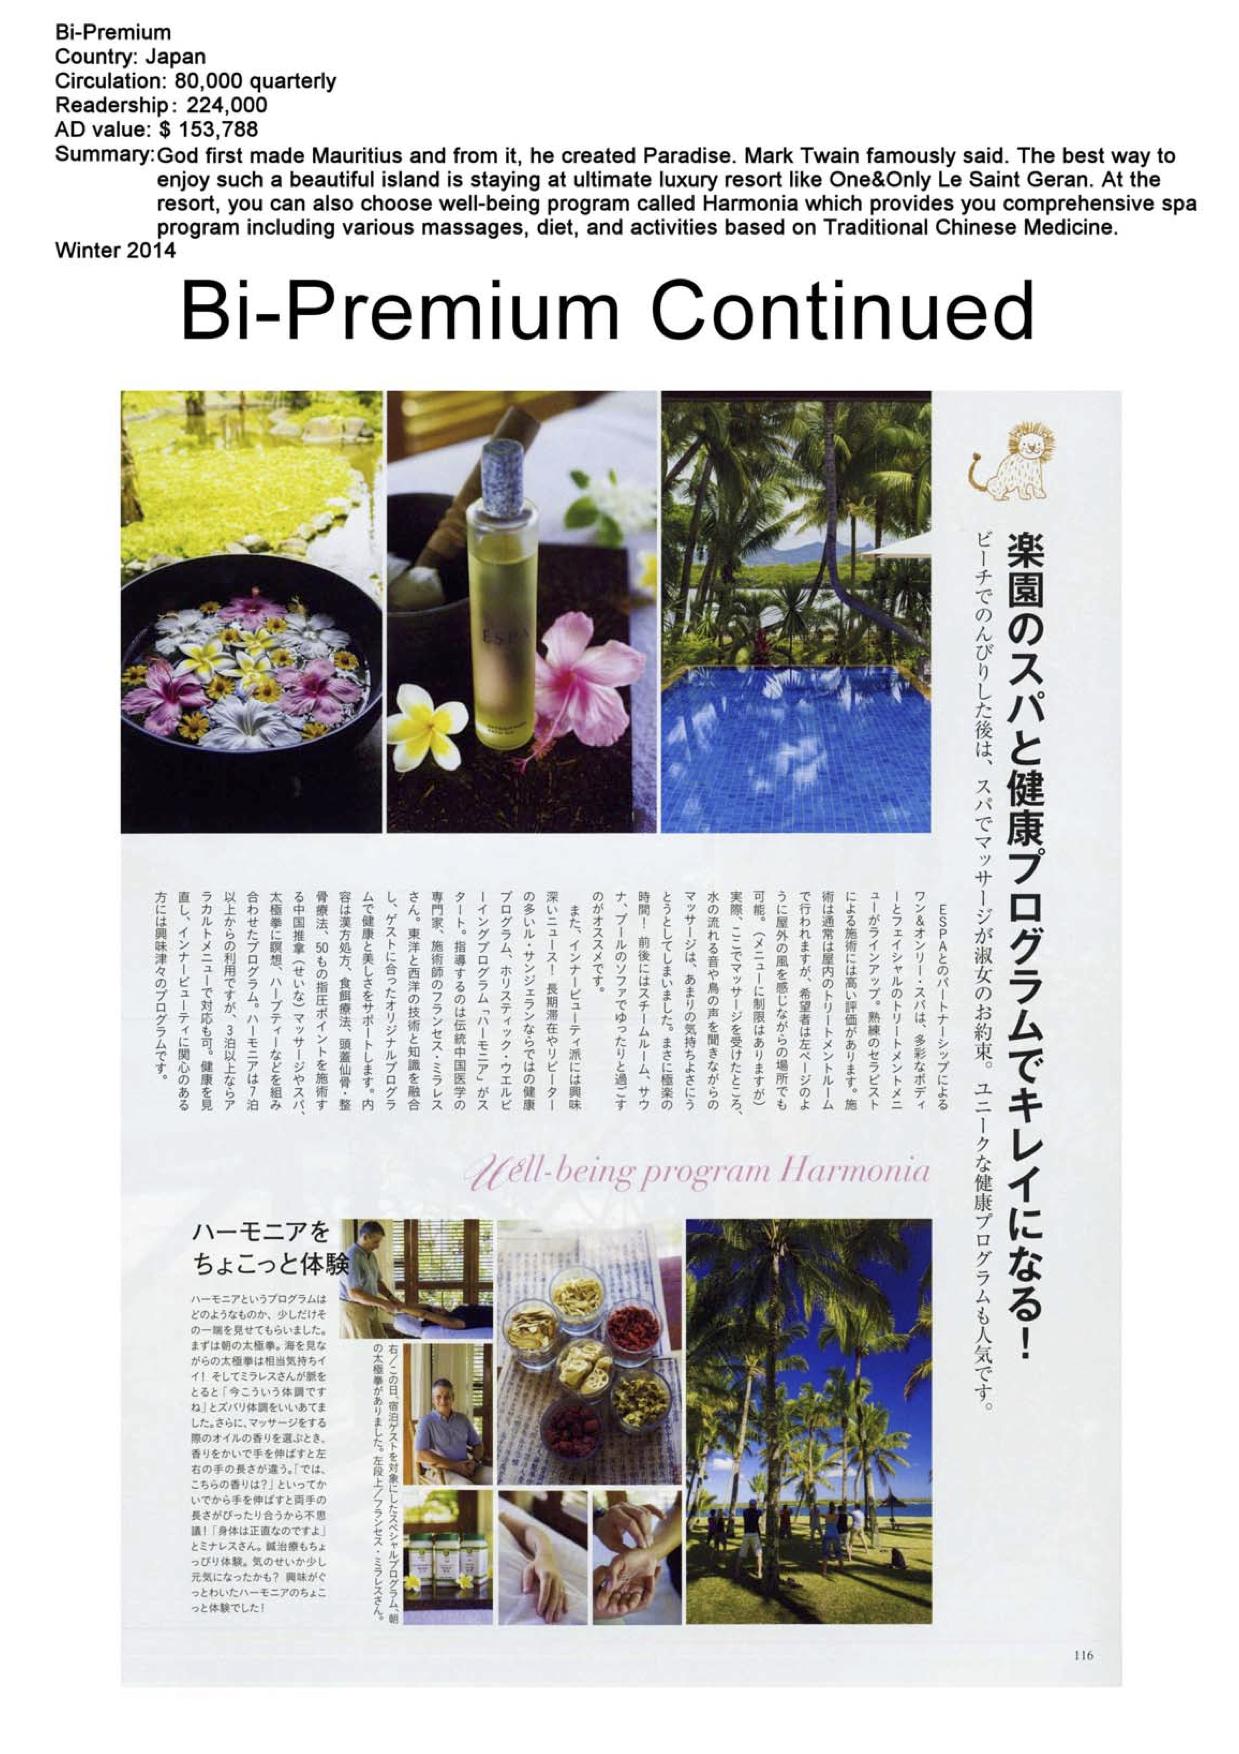 Bi-Premium - OOLSG - Winter 2014